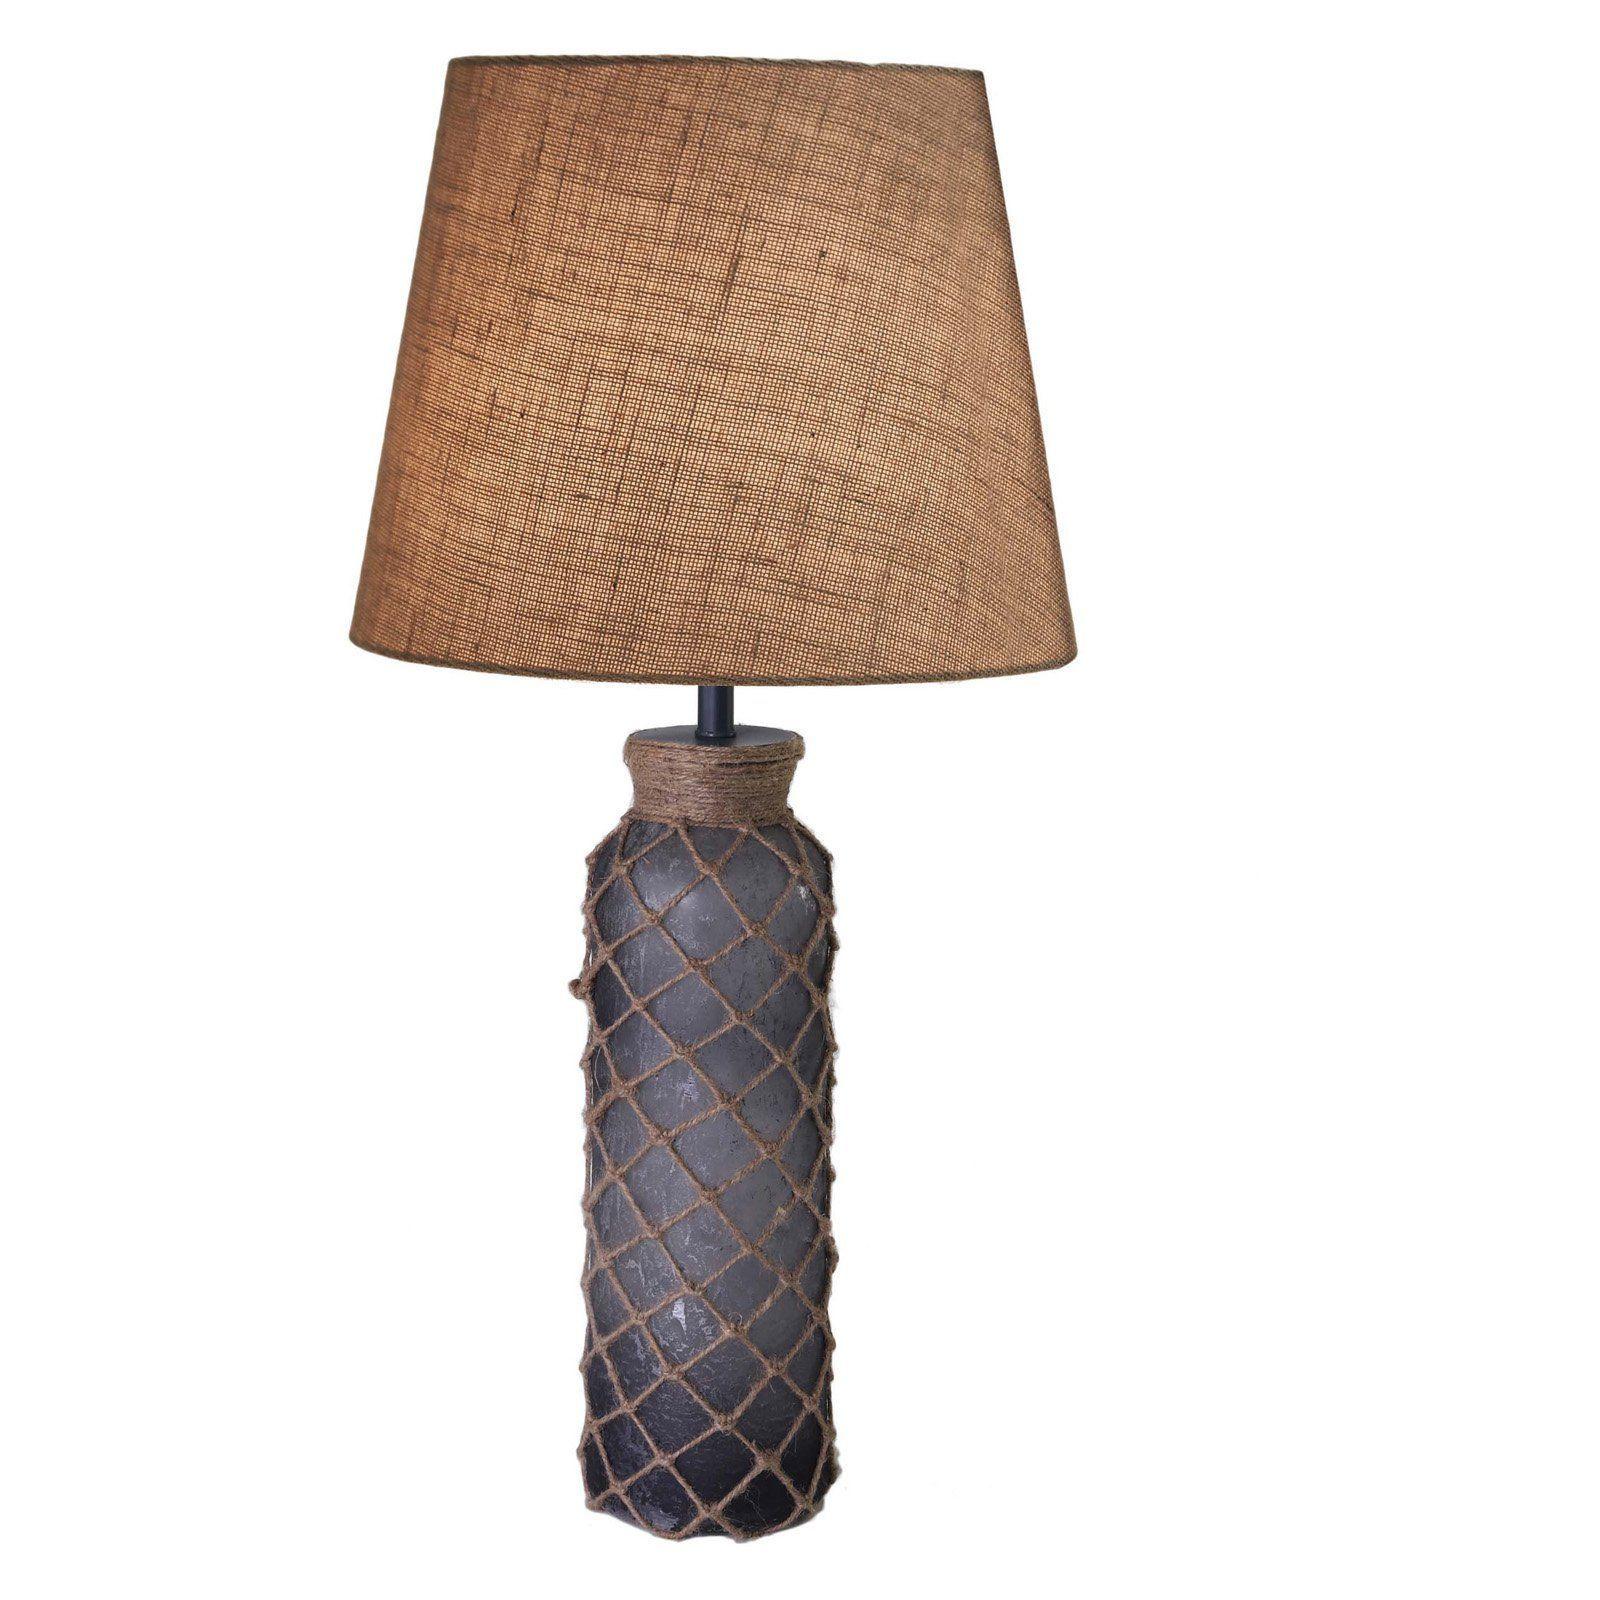 Kenroy Home Bates Table Lamp 32438blu Table Lamp Blue Table